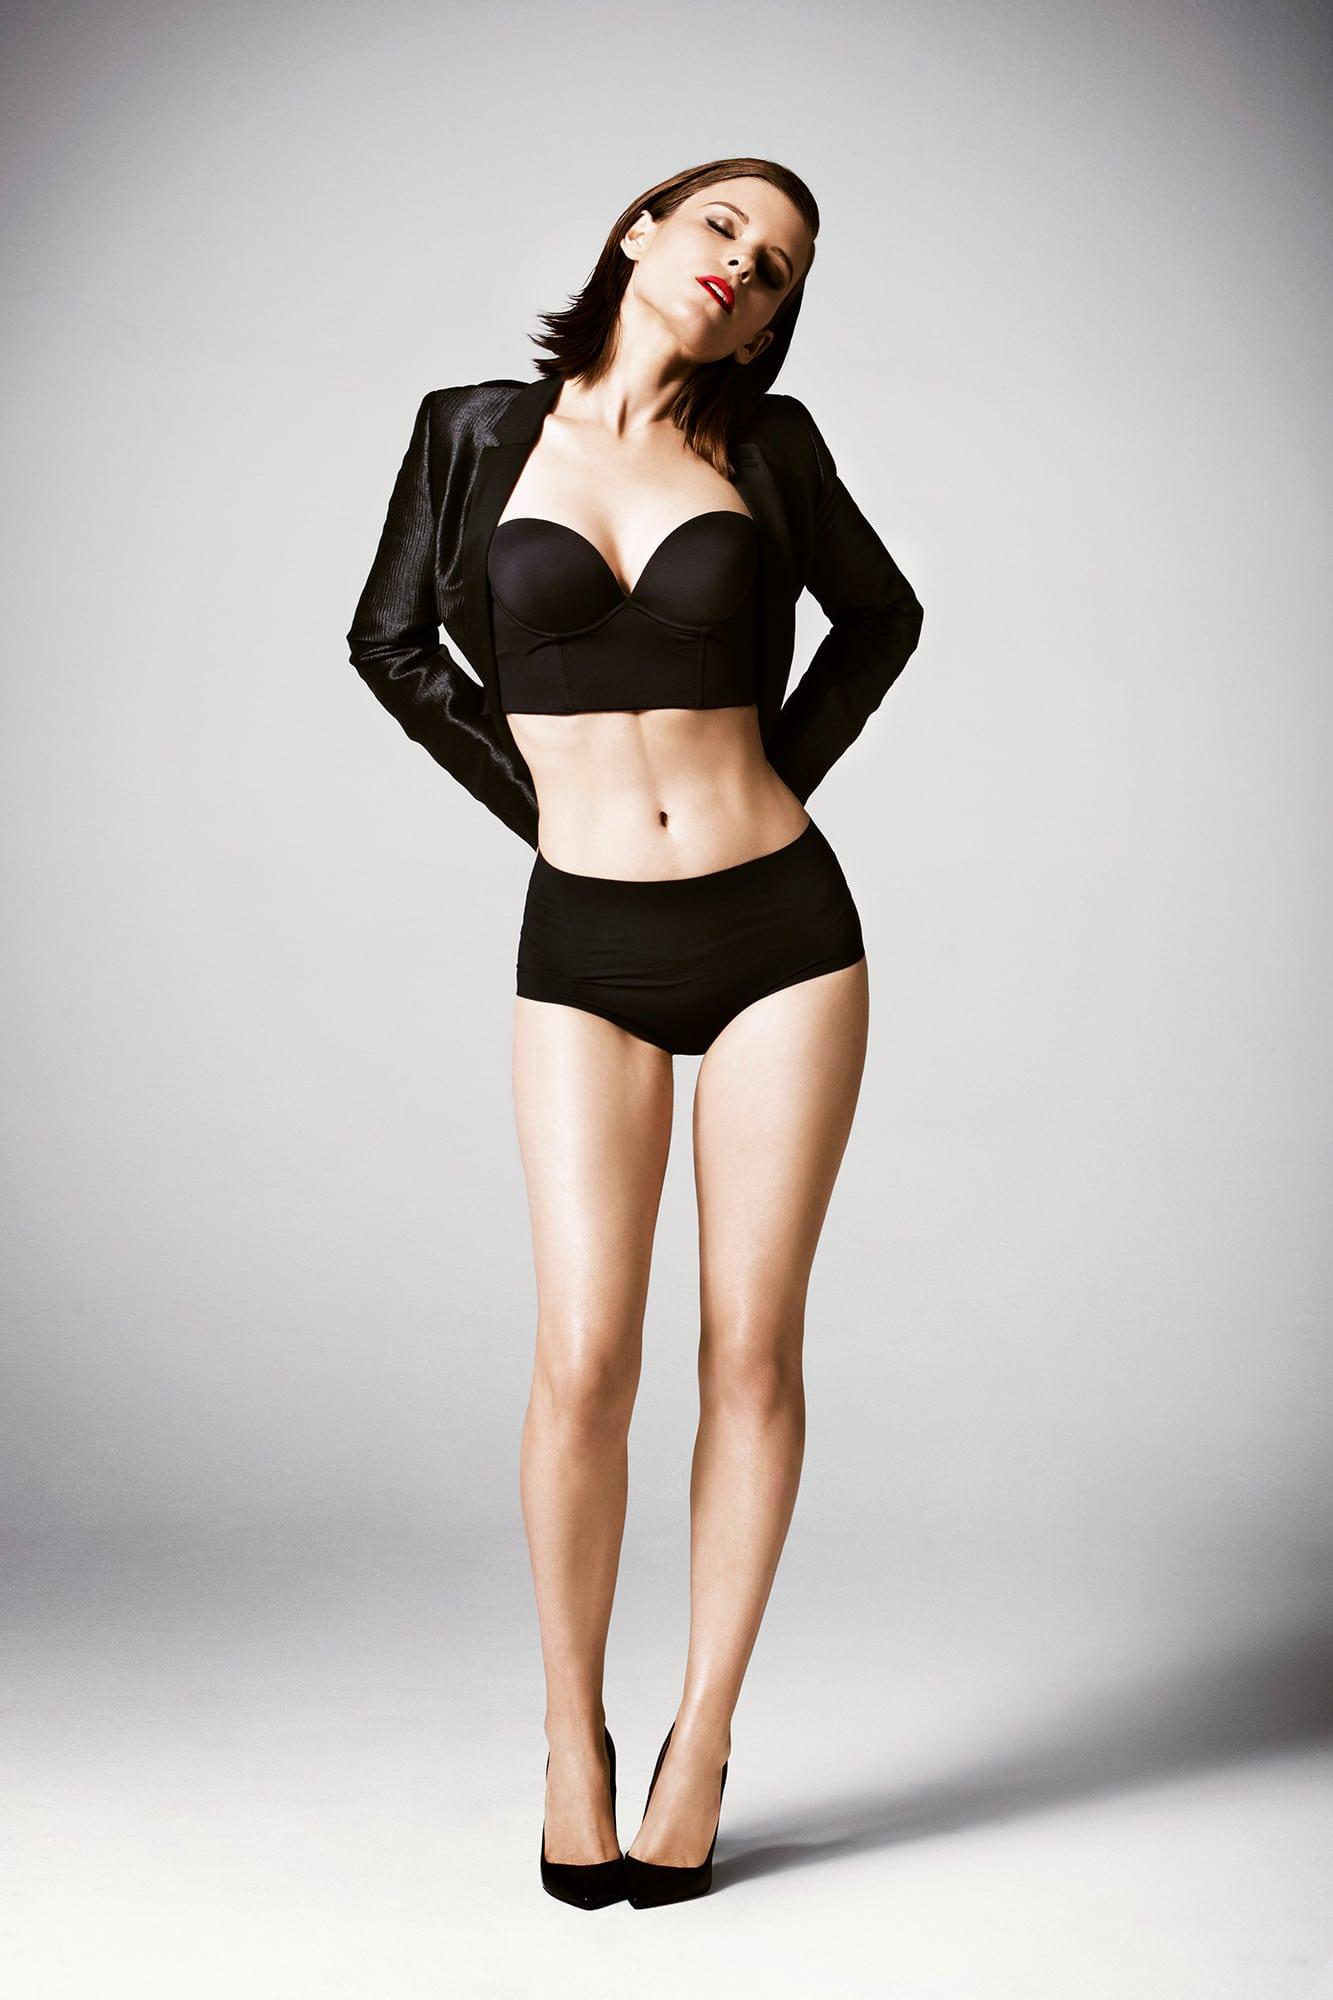 Kate Mara hot lingerie